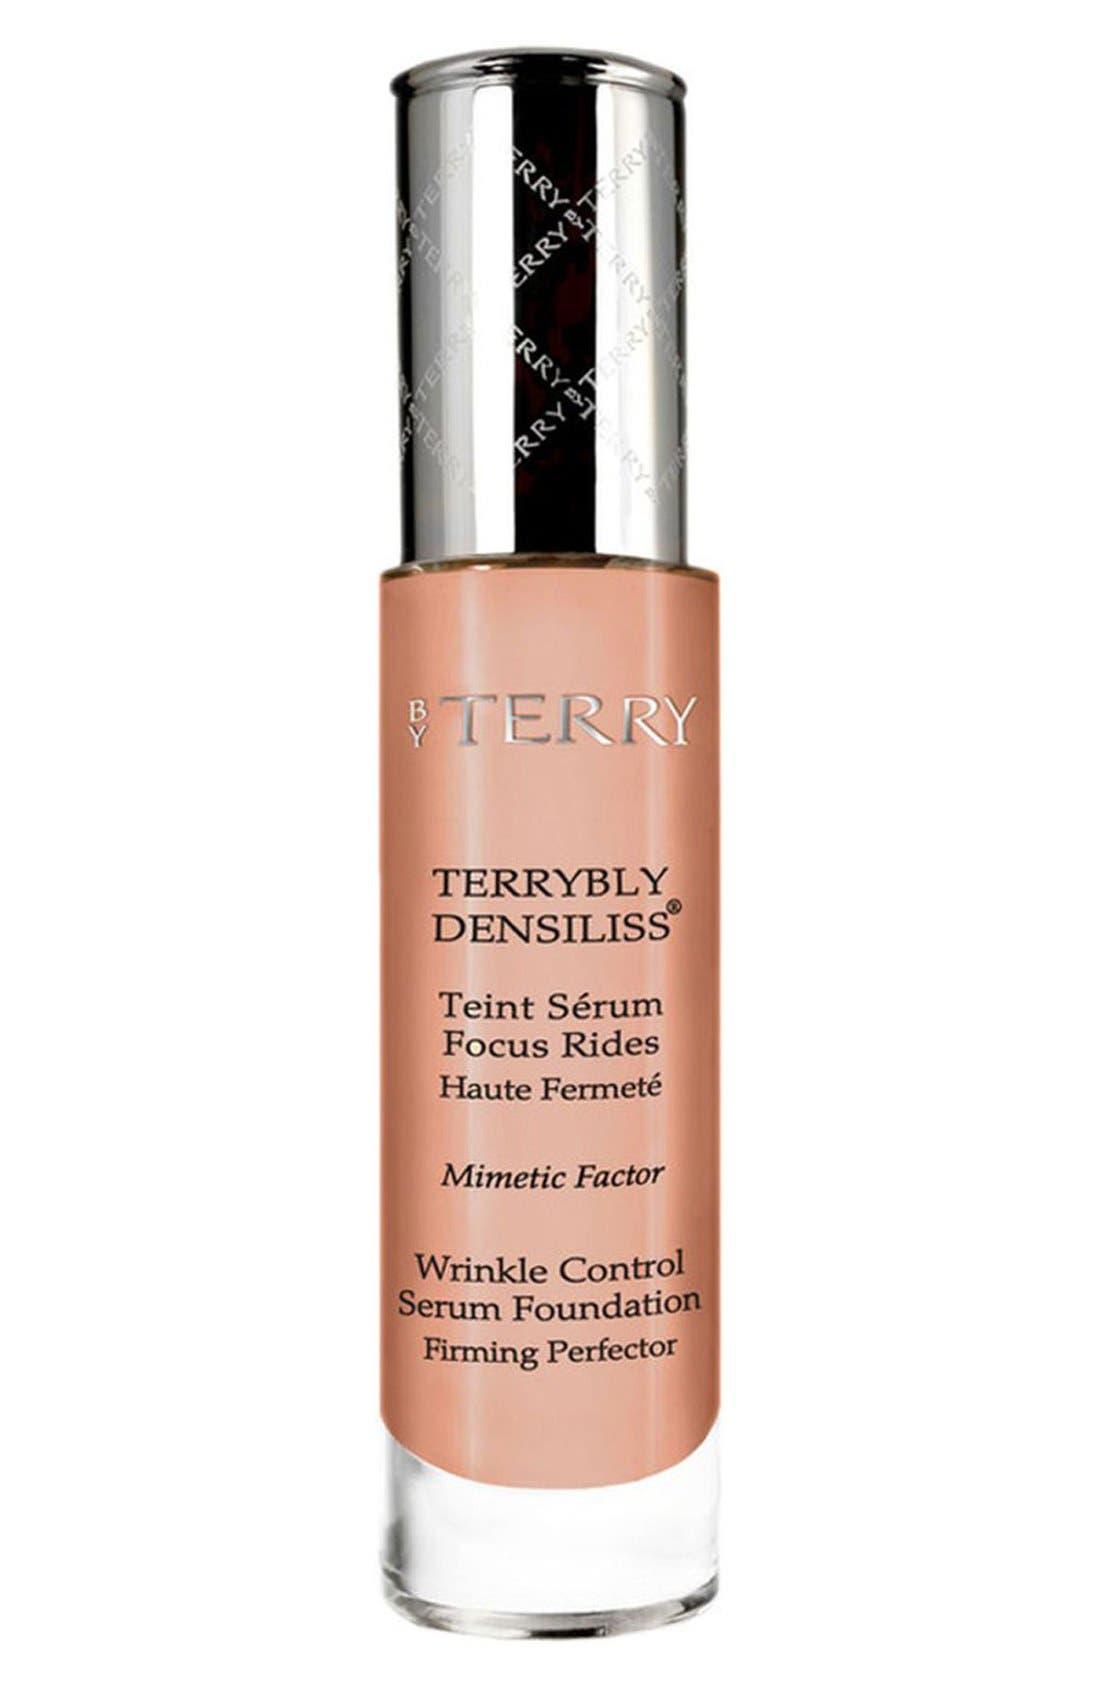 Terrybly Densiliss Foundation